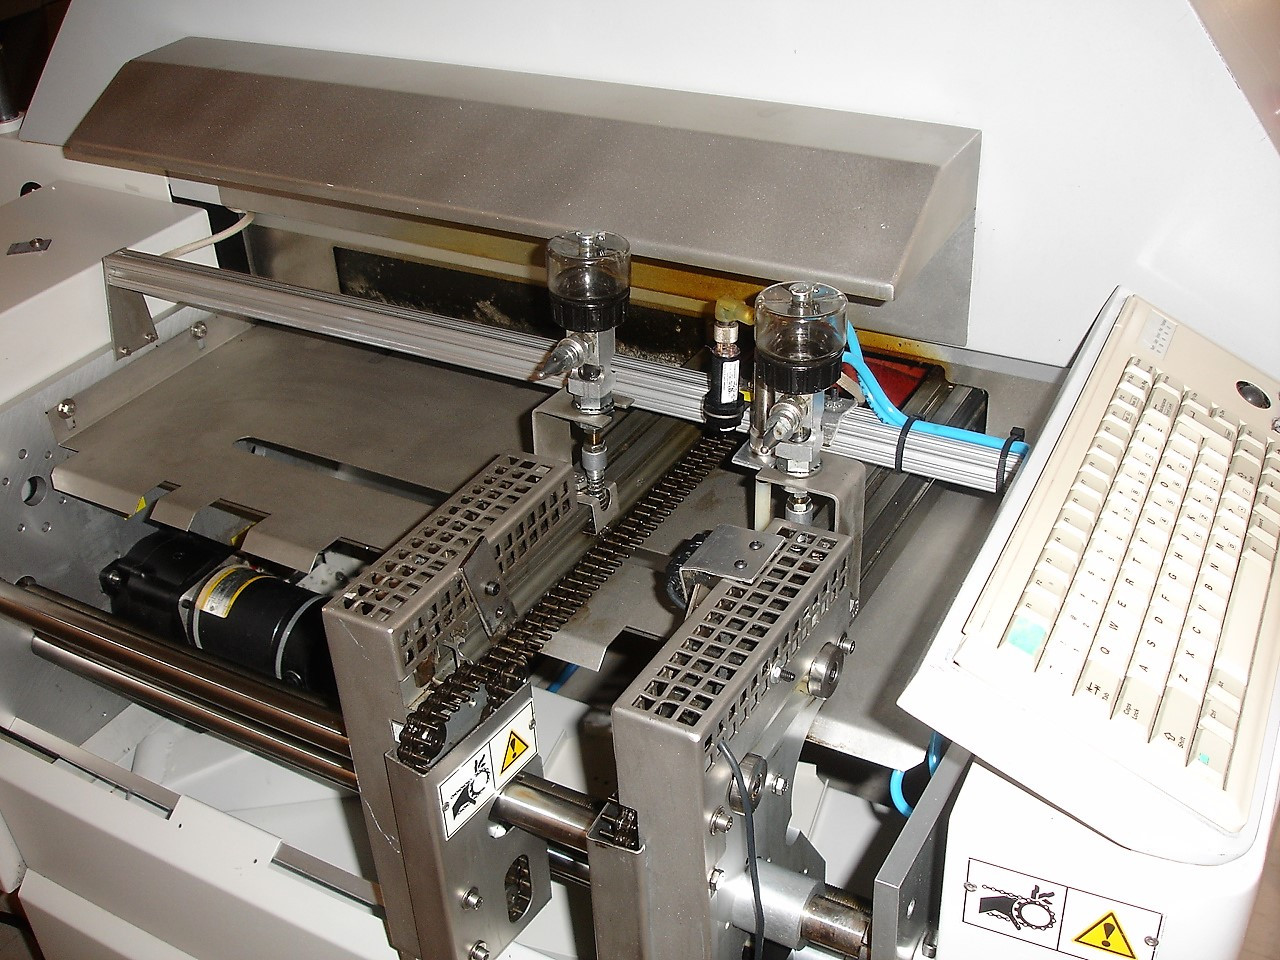 Speedline - Electrovert Omni 7 Reflow Oven